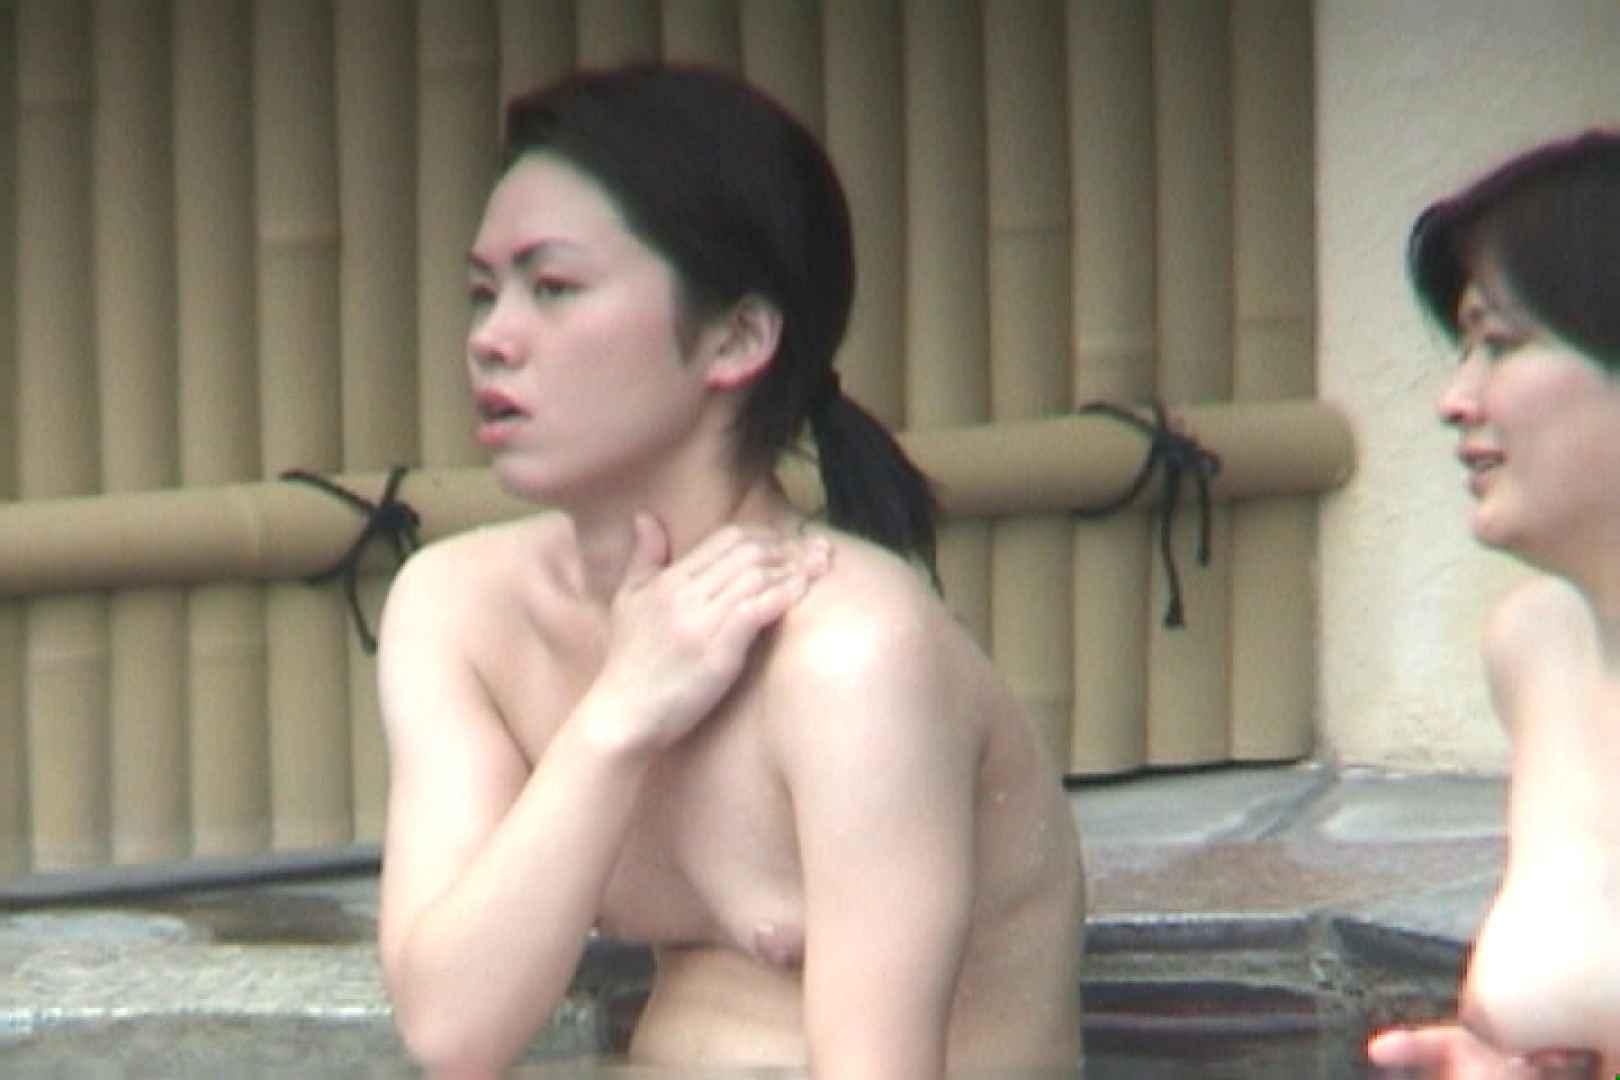 Aquaな露天風呂Vol.558 美しいOLの裸体 AV無料動画キャプチャ 86pic 50